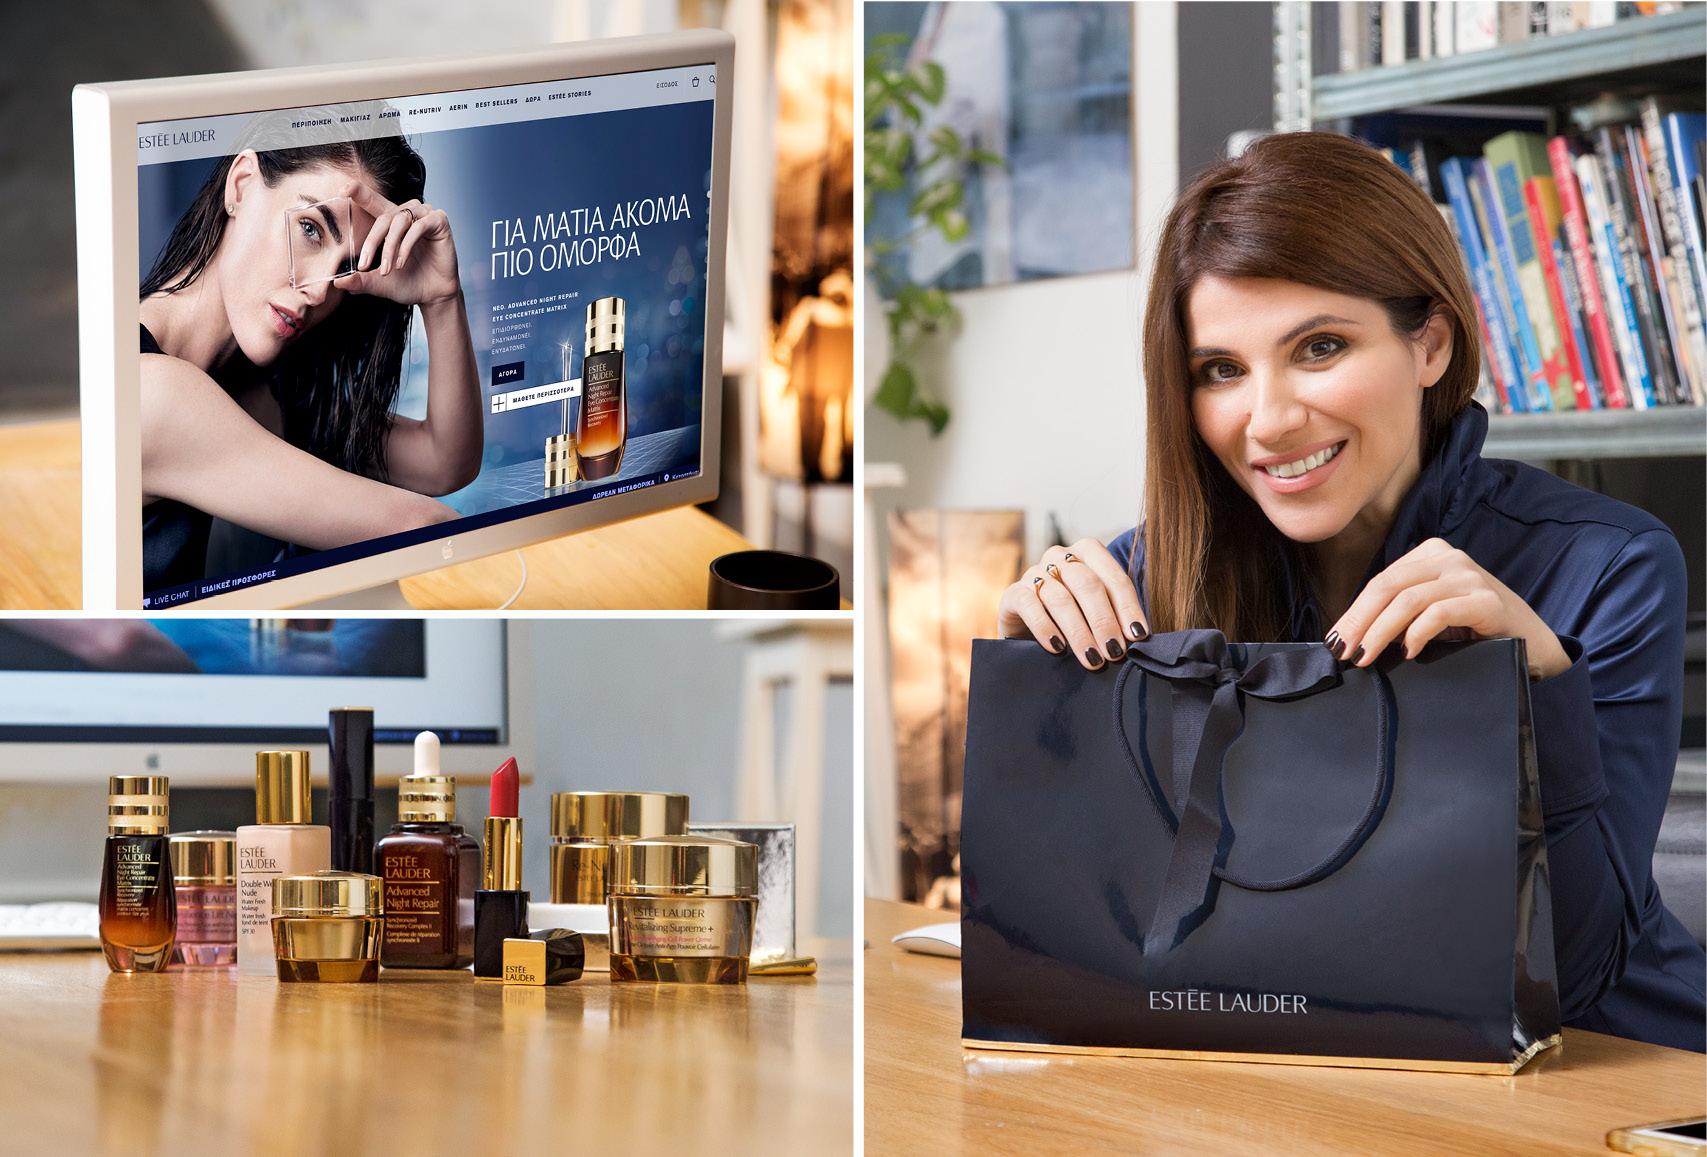 Estee lauder online shop